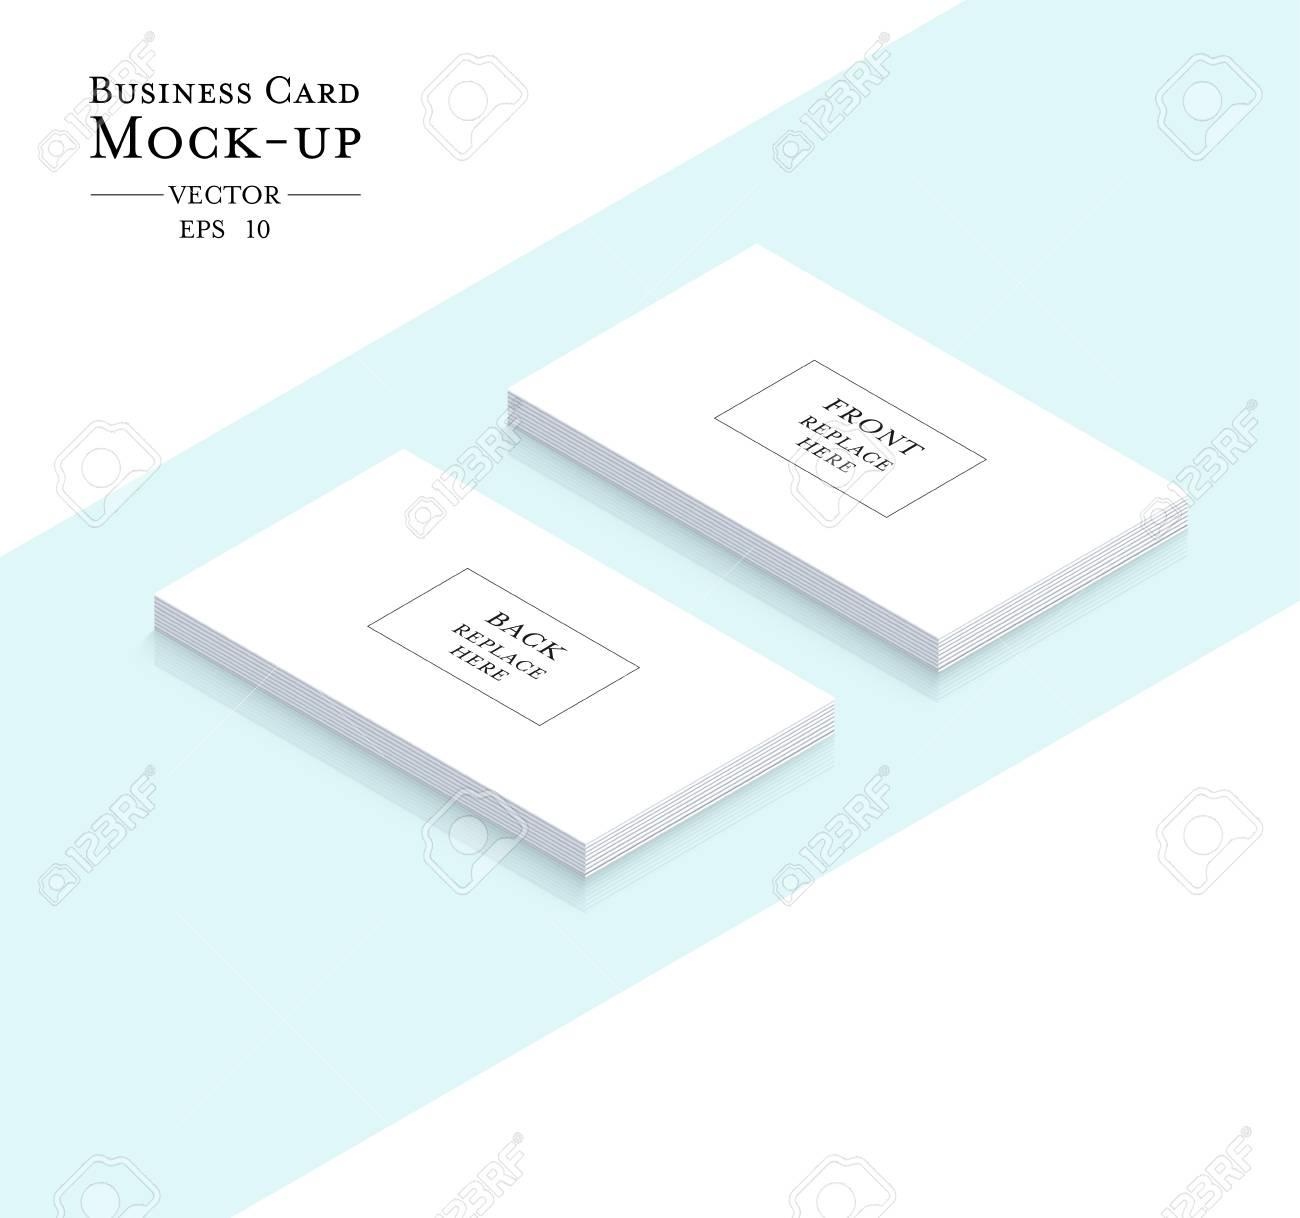 Business Cards Blank Mockup Template Design